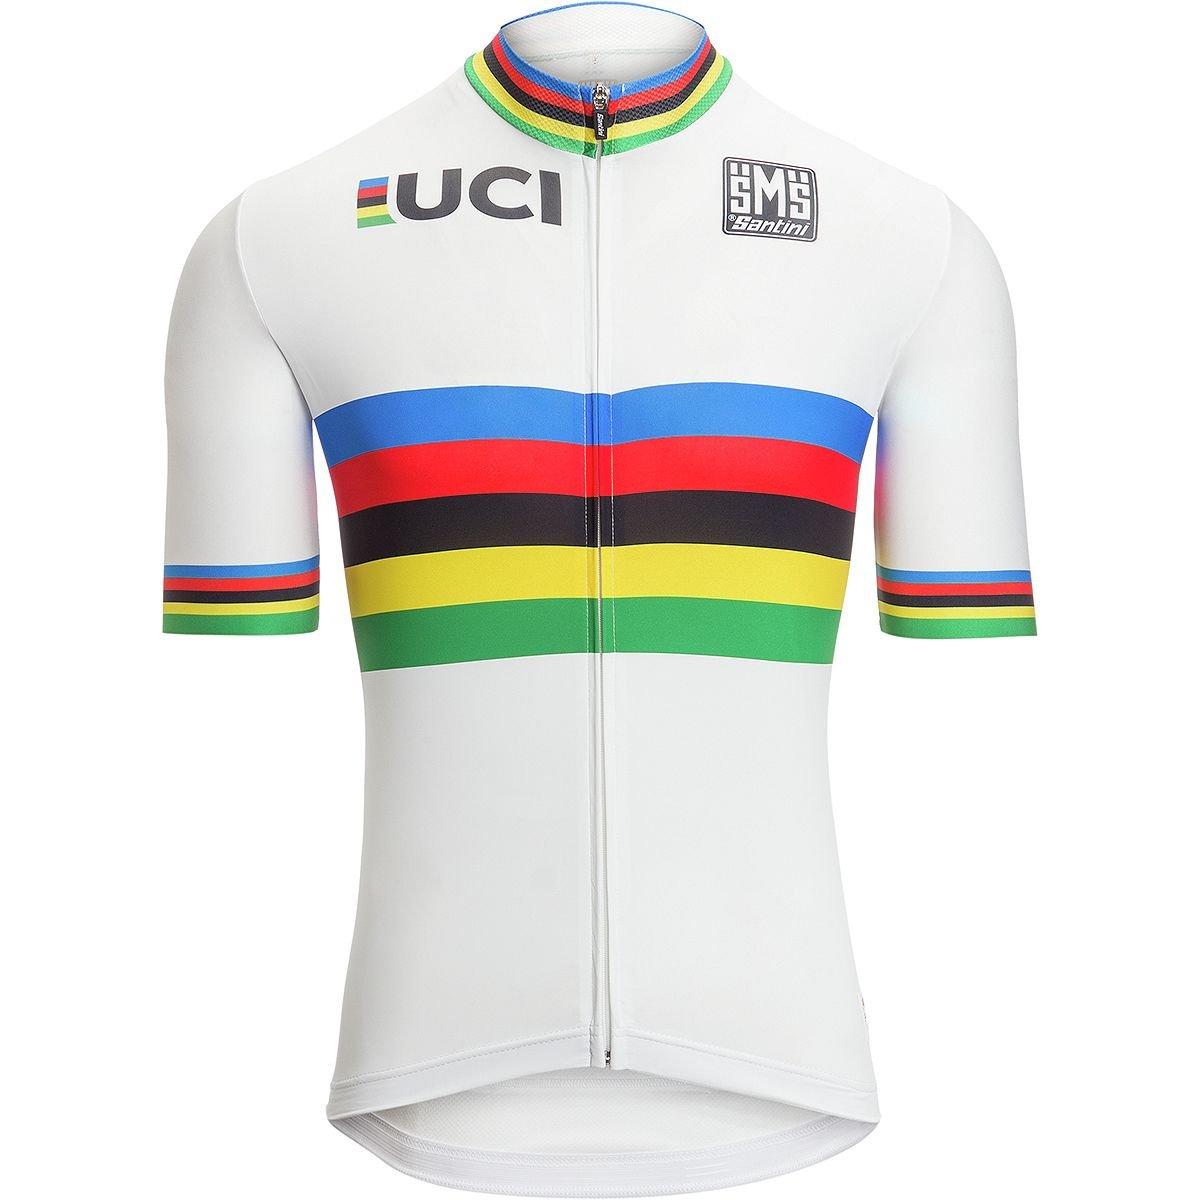 Santini UCI World Champion半袖Jersey – Men 's B079T3CH1N Small|1色 1色 Small